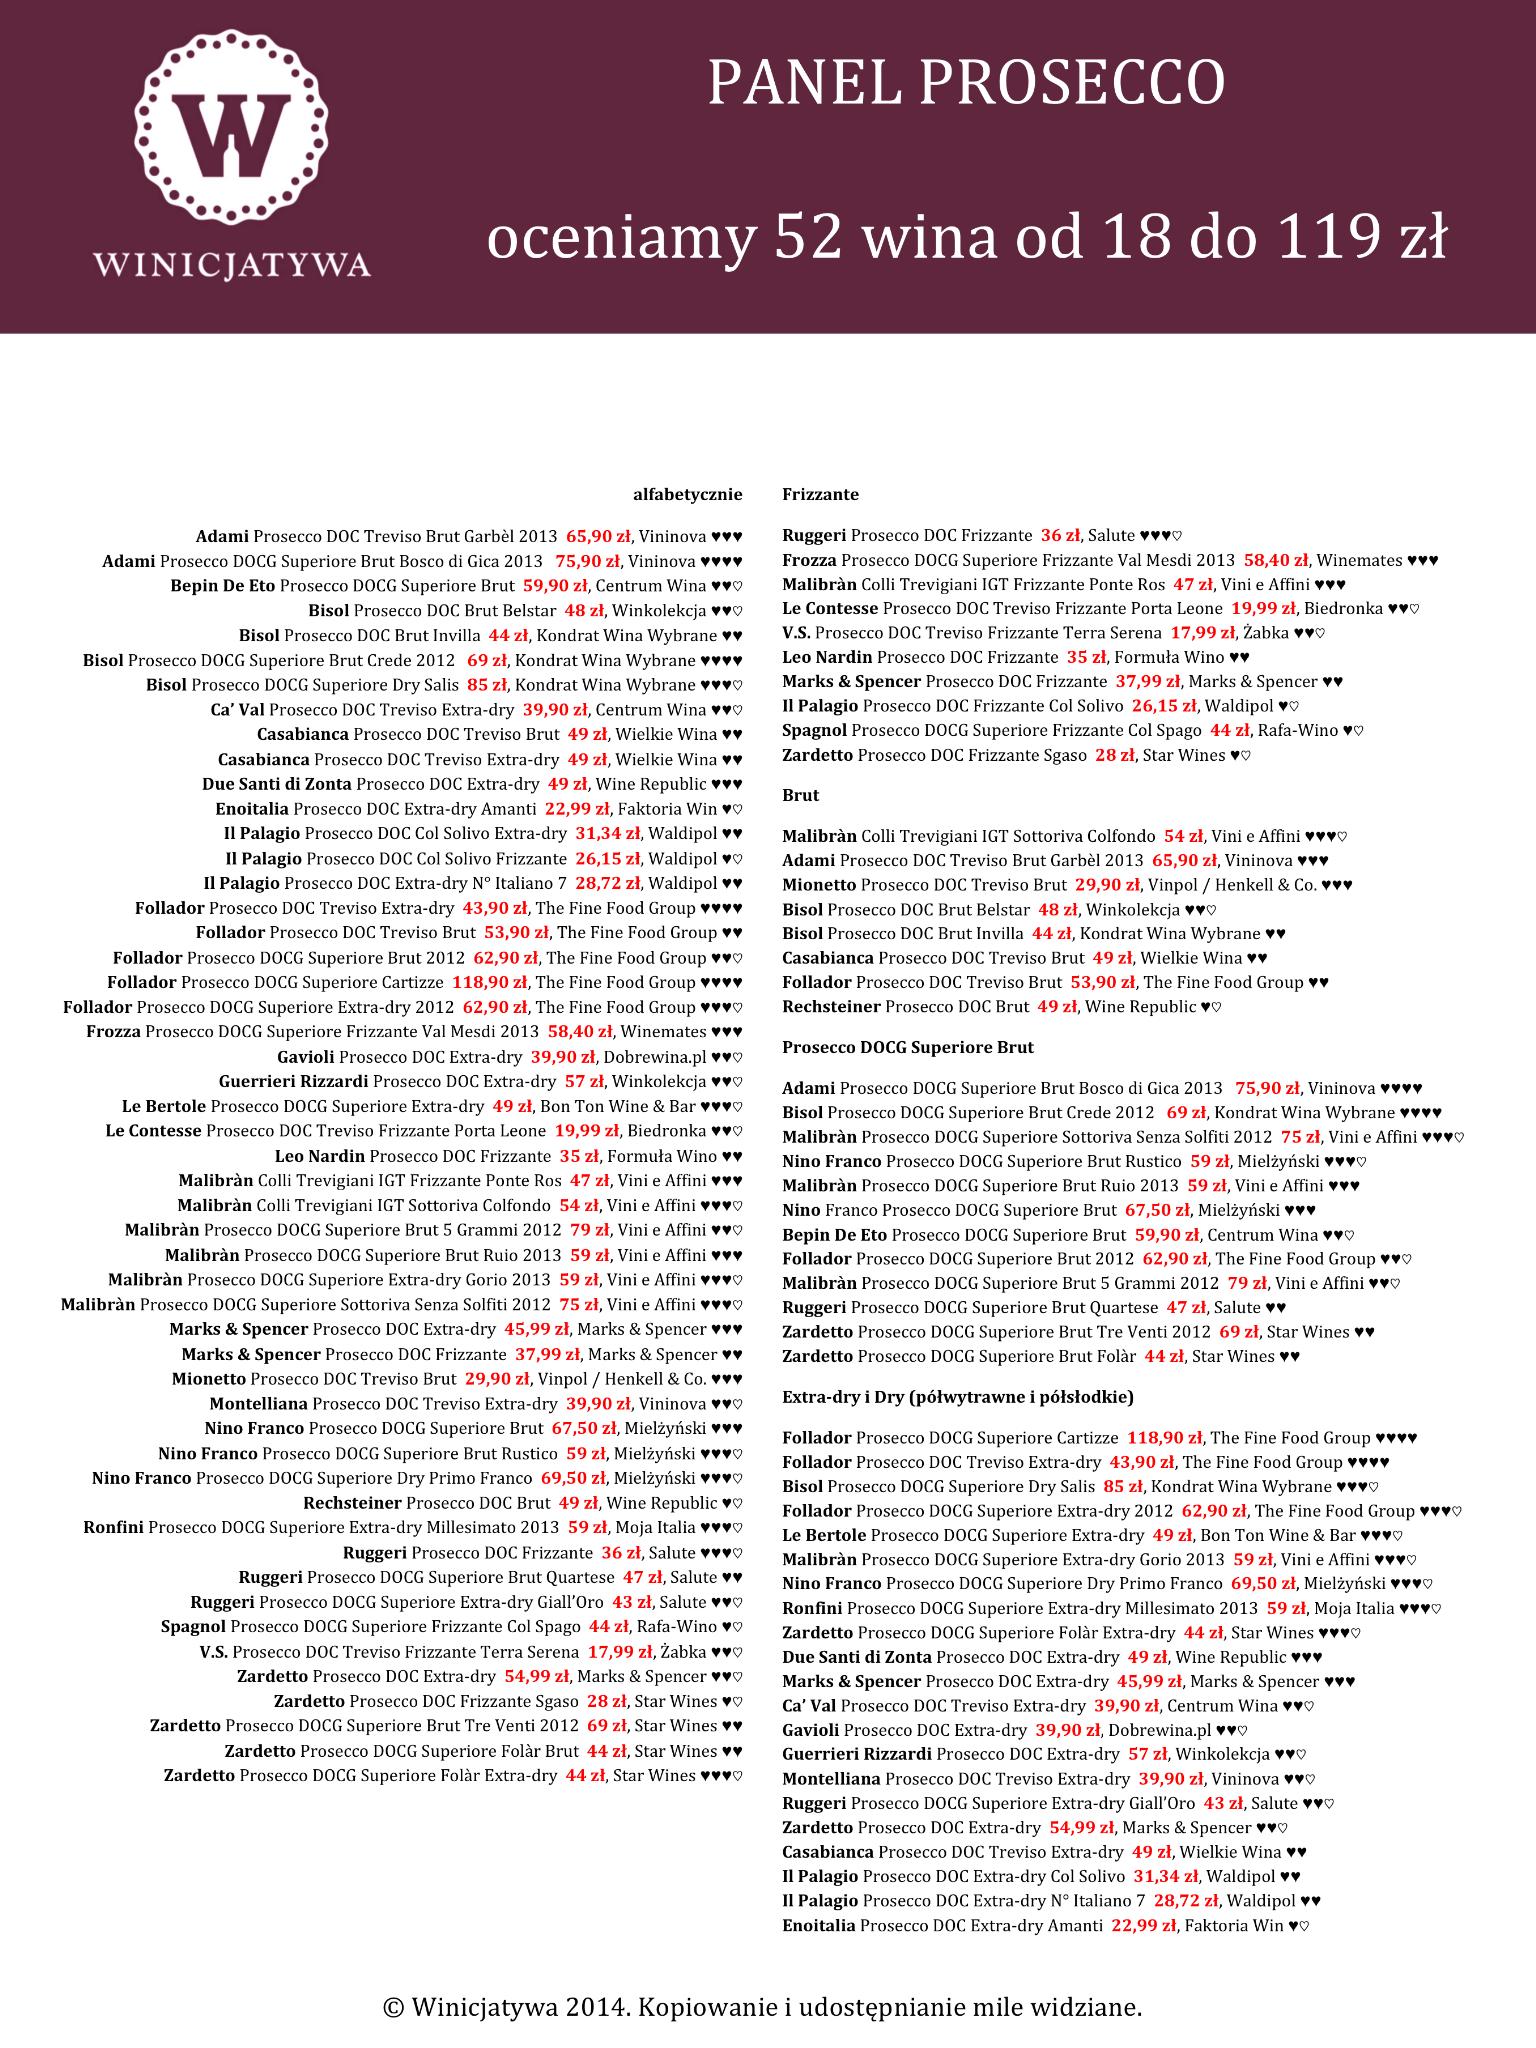 20140624_20140624_panel_prosecco_infografika